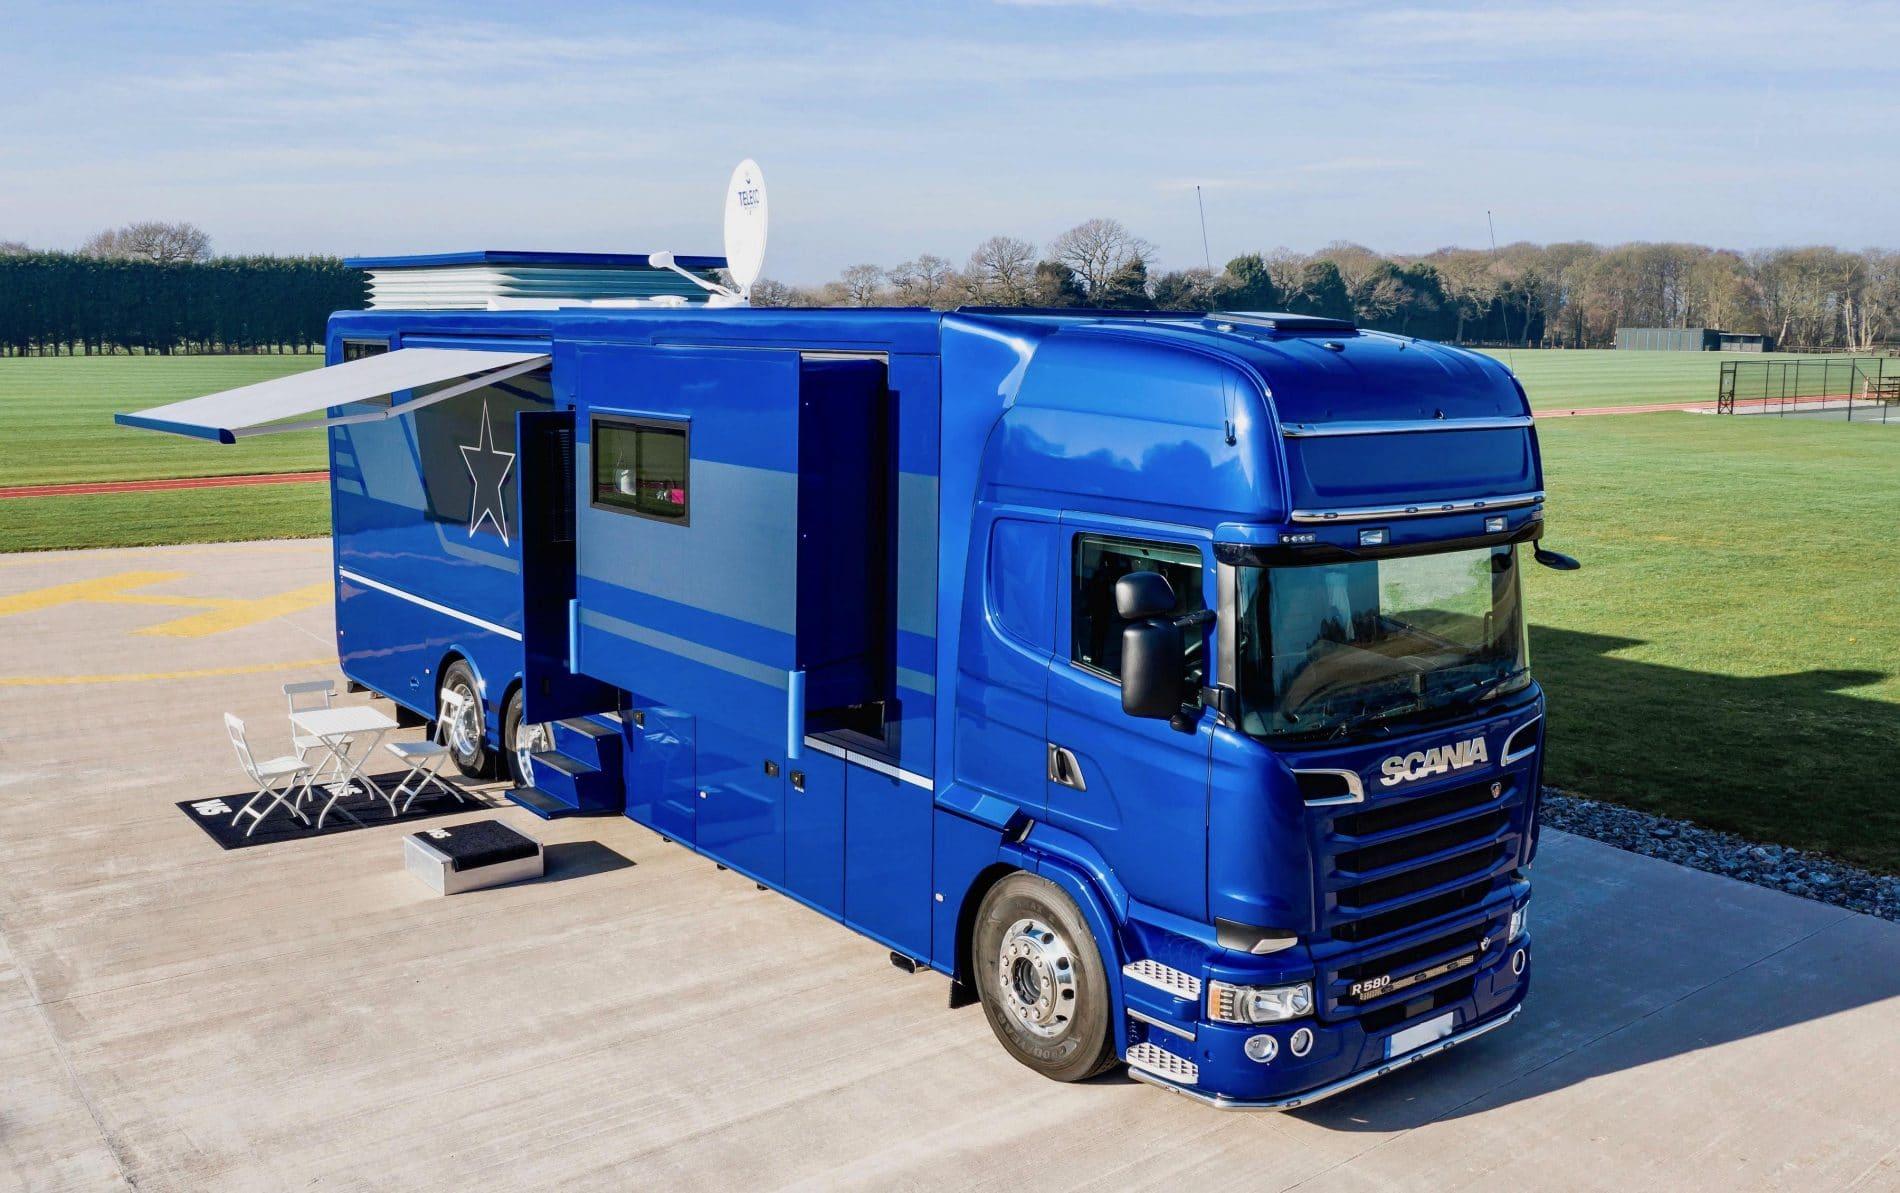 Scania V8 STX Luxury Motorhome for sale - American Motorhome